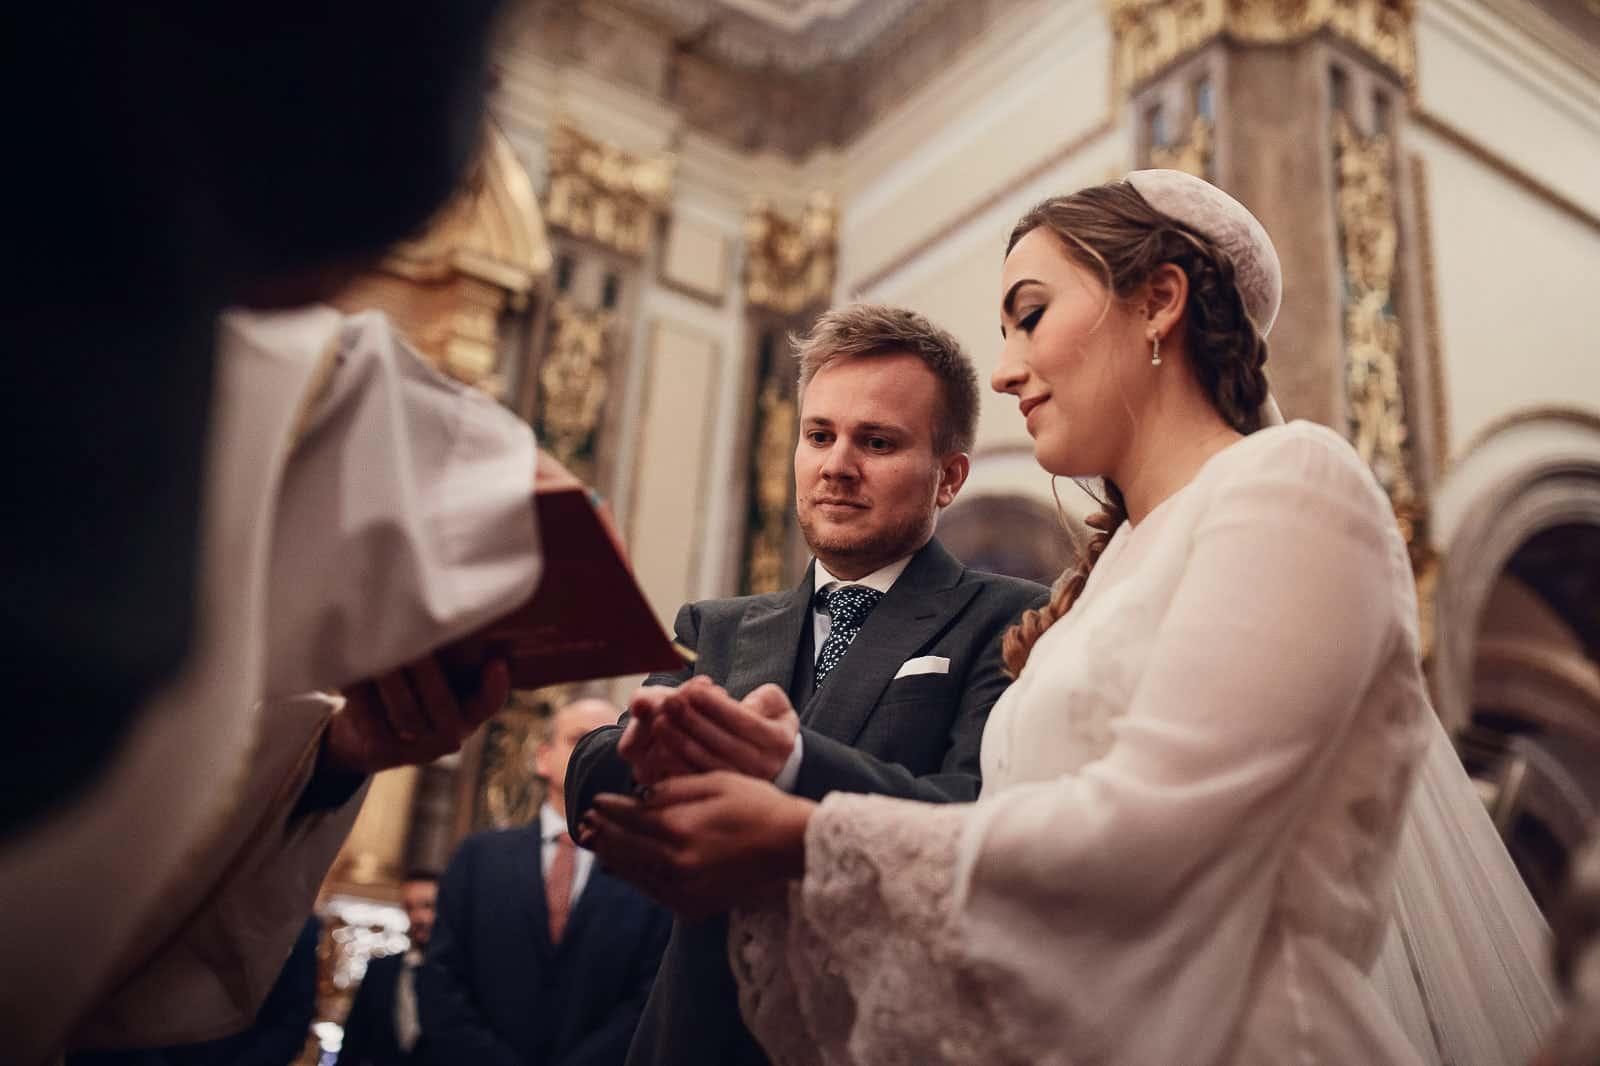 novios arras celebracion boda cura